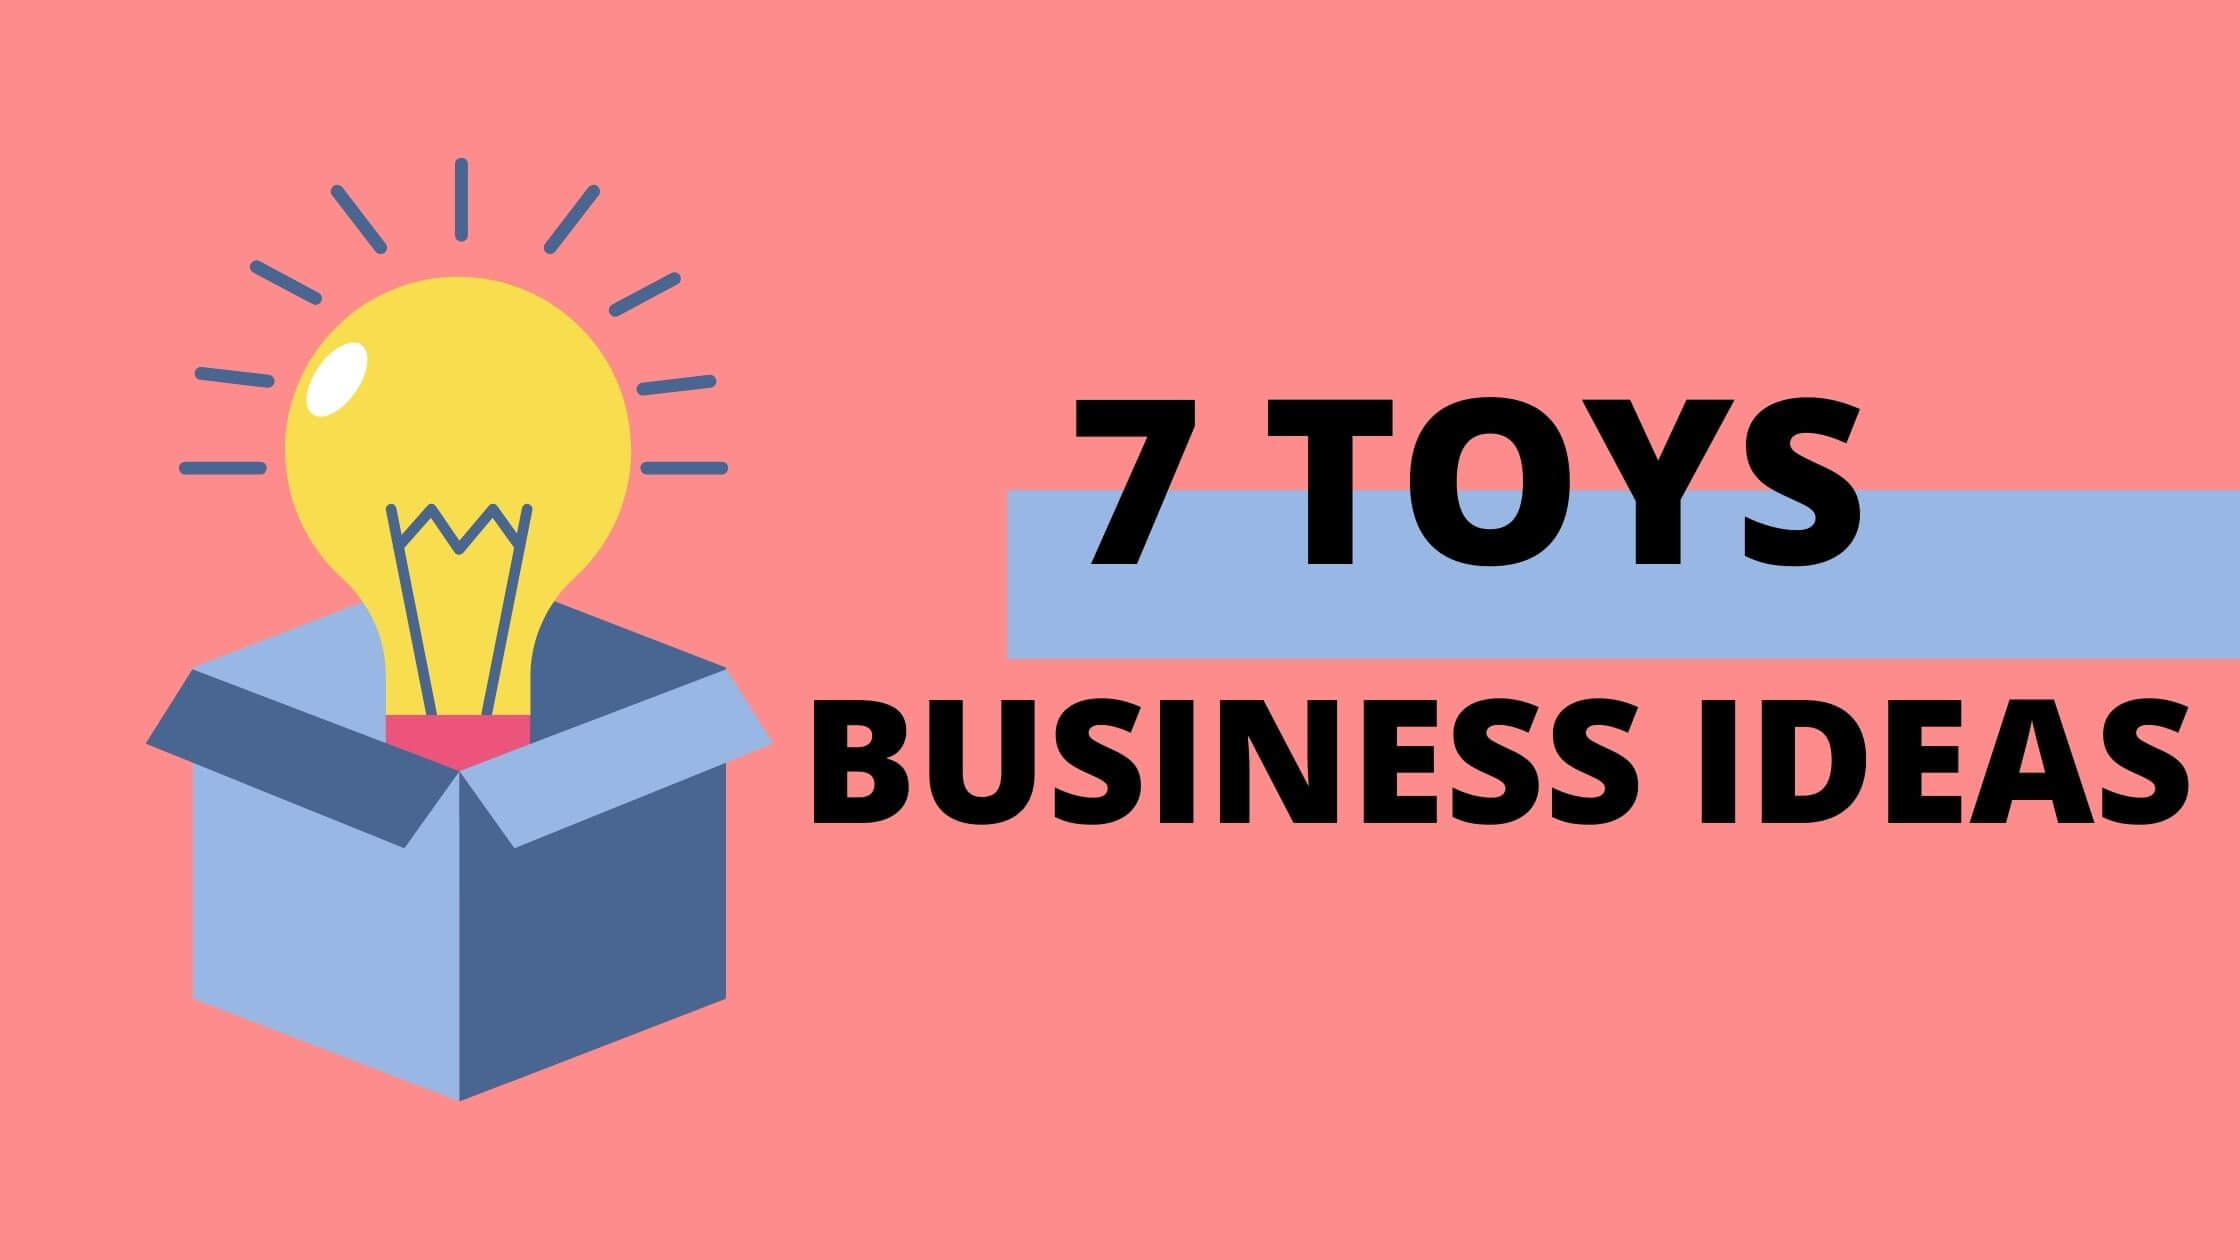 7 TOYS BUSINESS IDEA